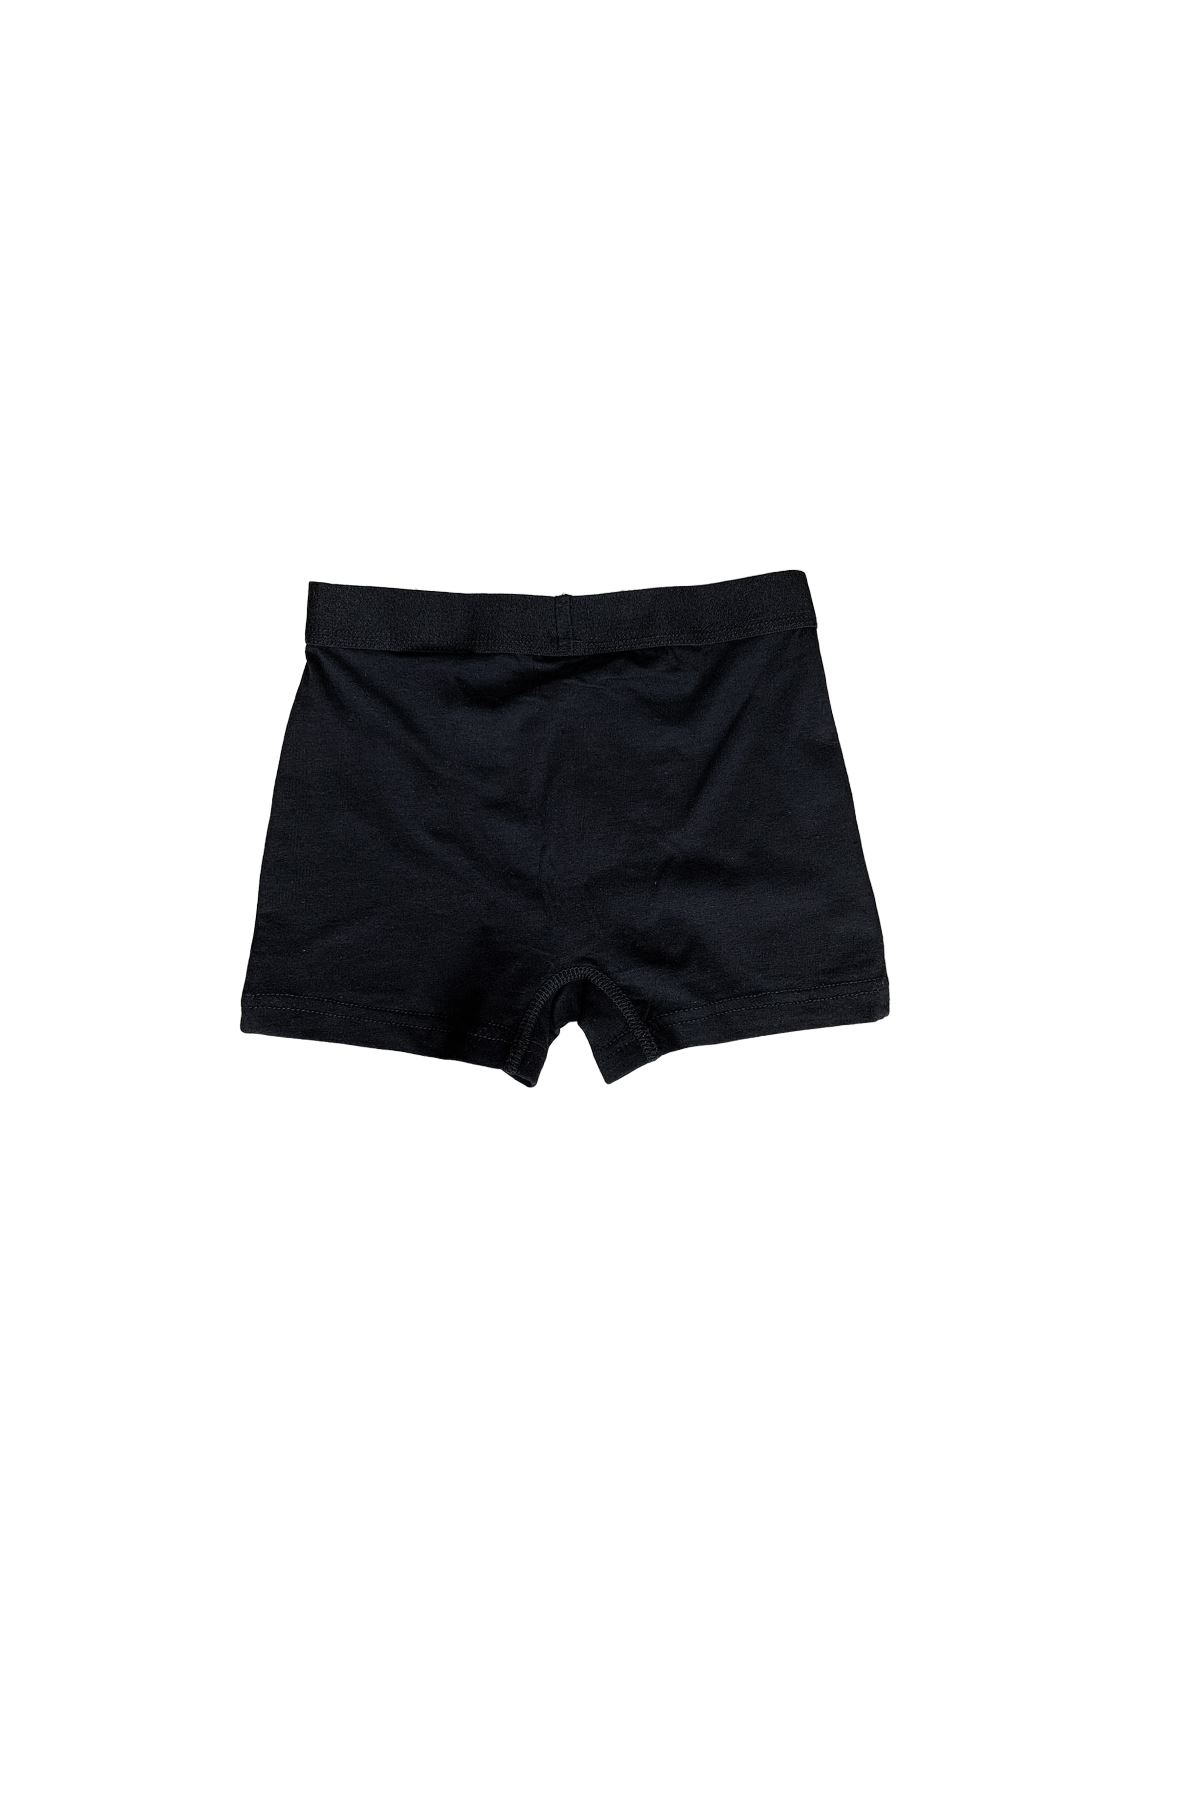 Siyah Erkek Çocuk Pamuklu Boxer 208